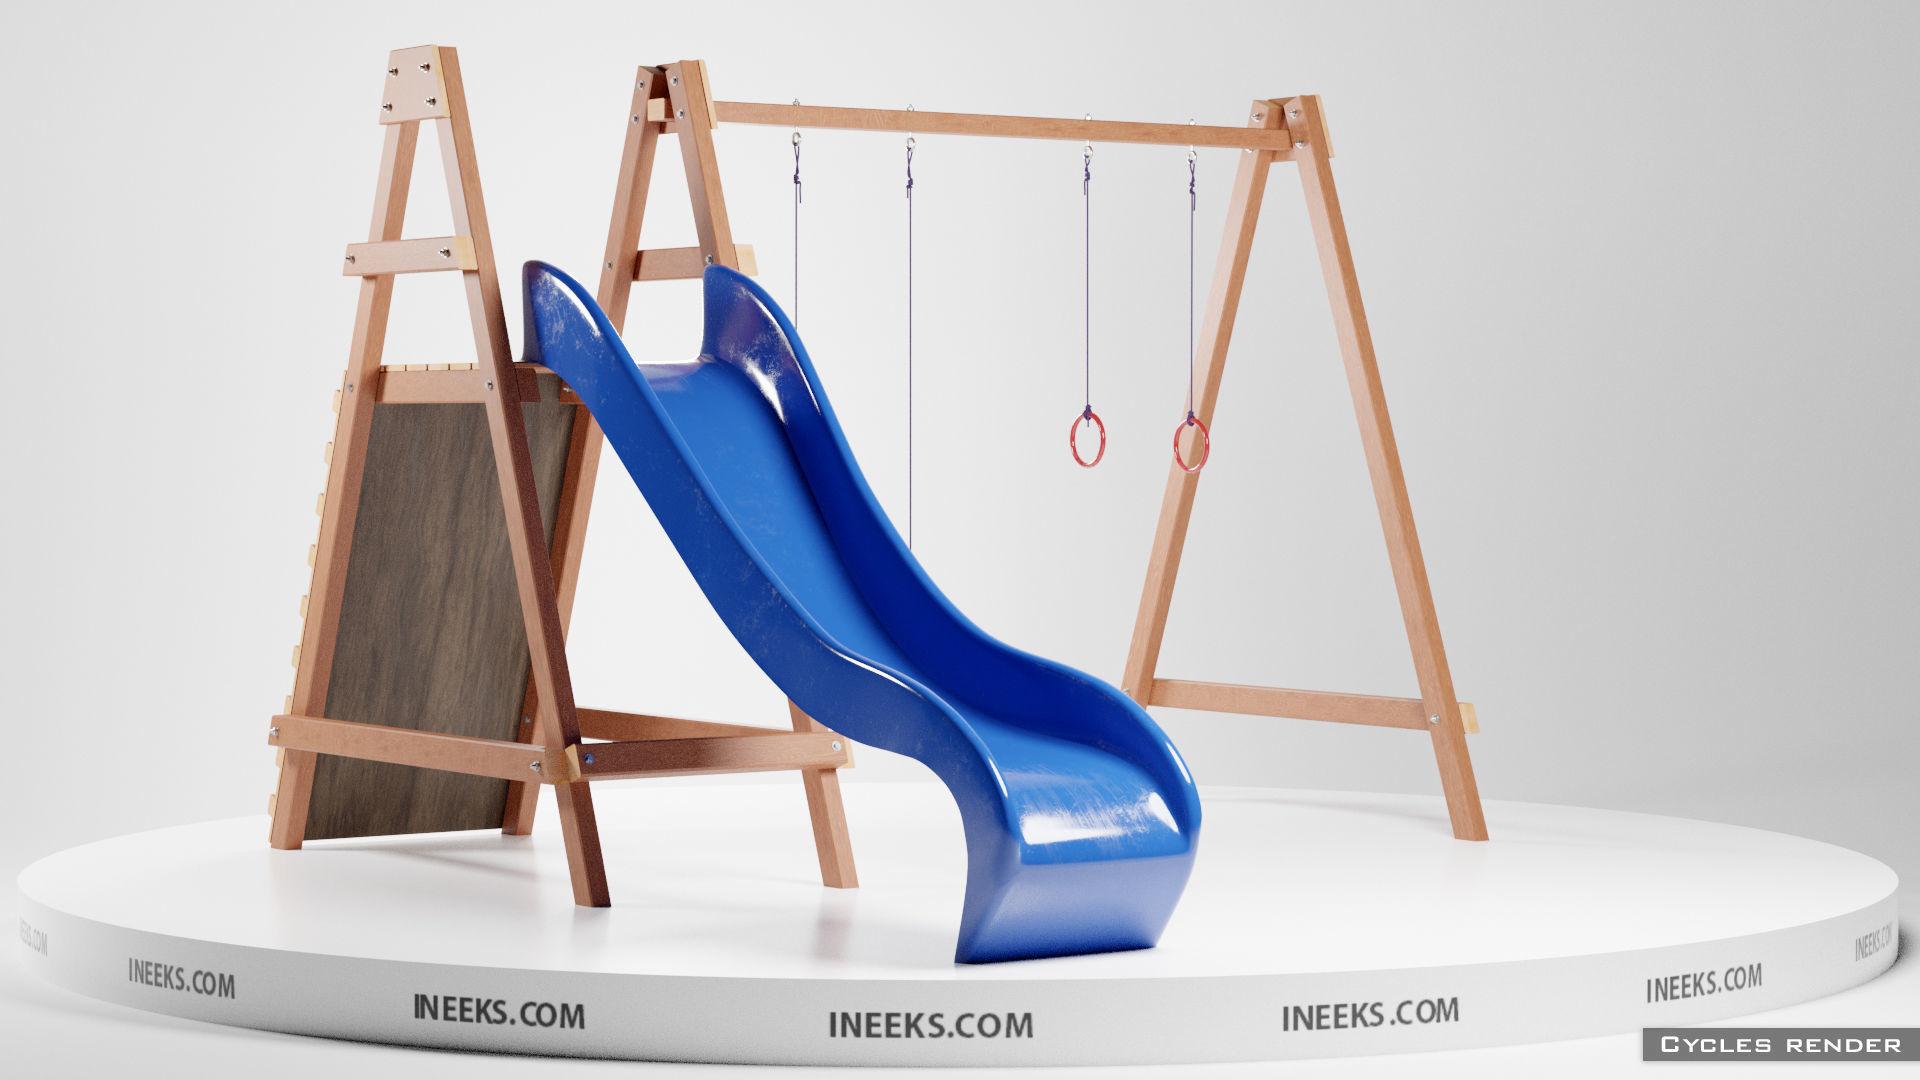 Wooden outdoor swing set with slide